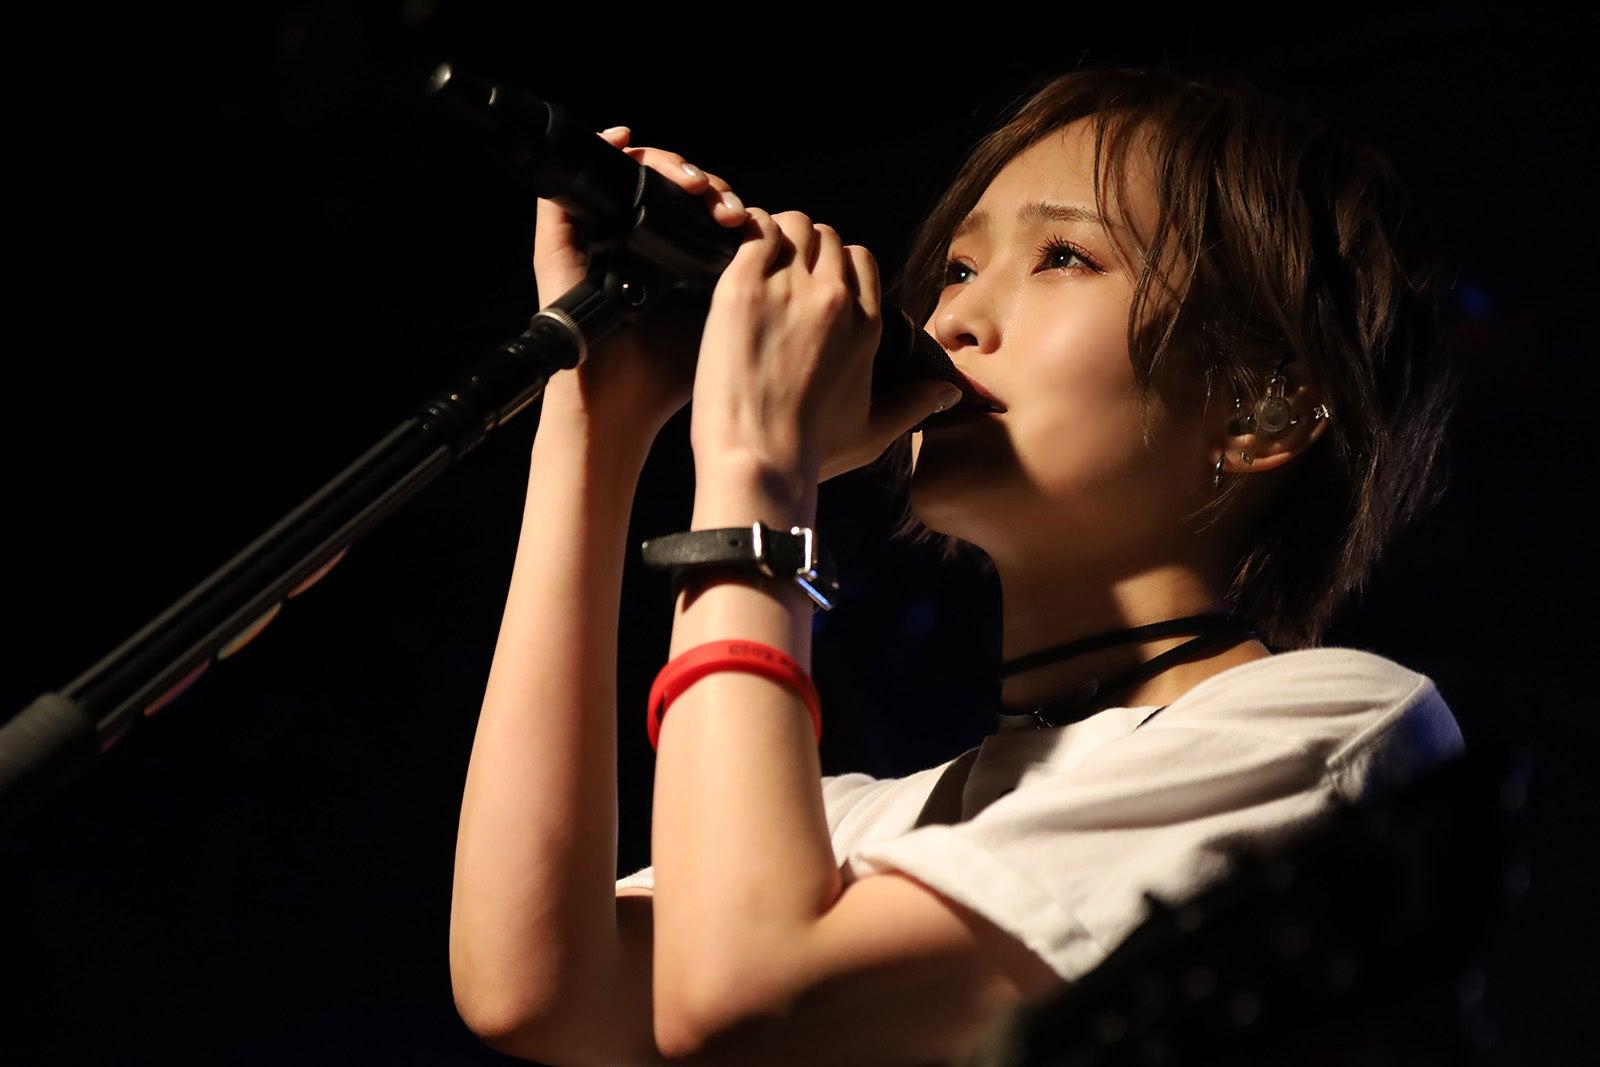 【NMB48卒業生】山本彩応援スレPart846【さや姉】 YouTube動画>2本 ->画像>240枚